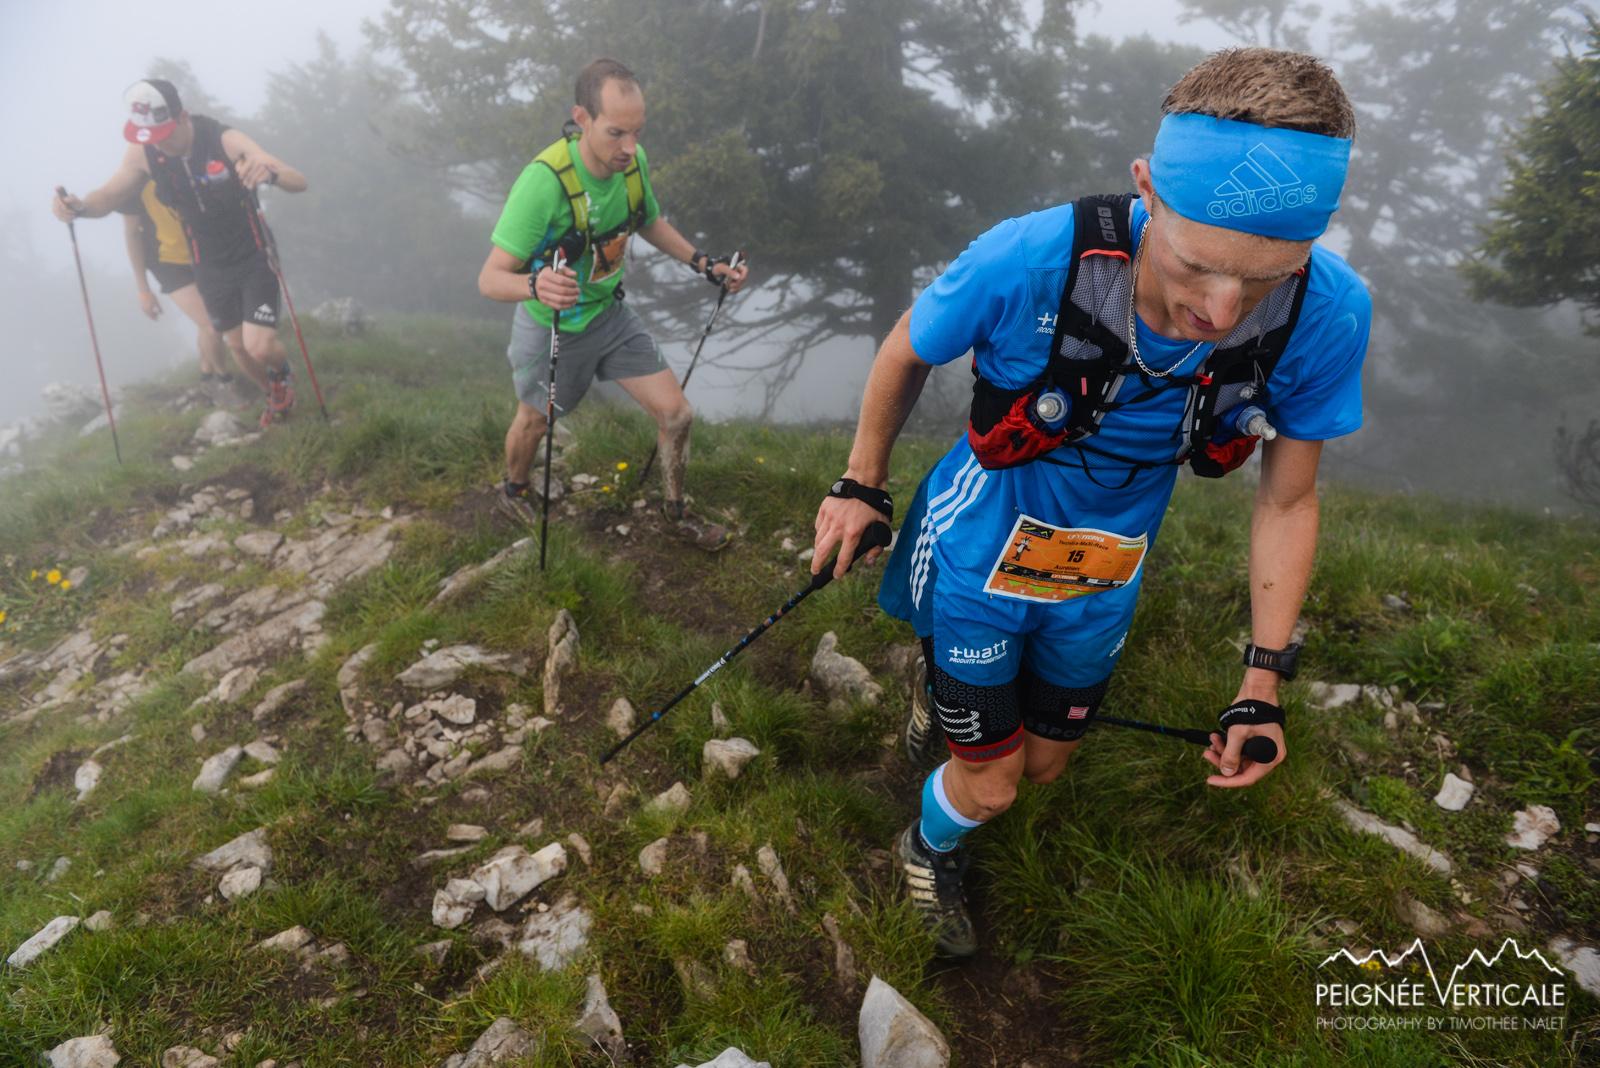 MaxiRace-Annecy-2014-Team-Hoka-Timothee-Nalet-1052.jpg